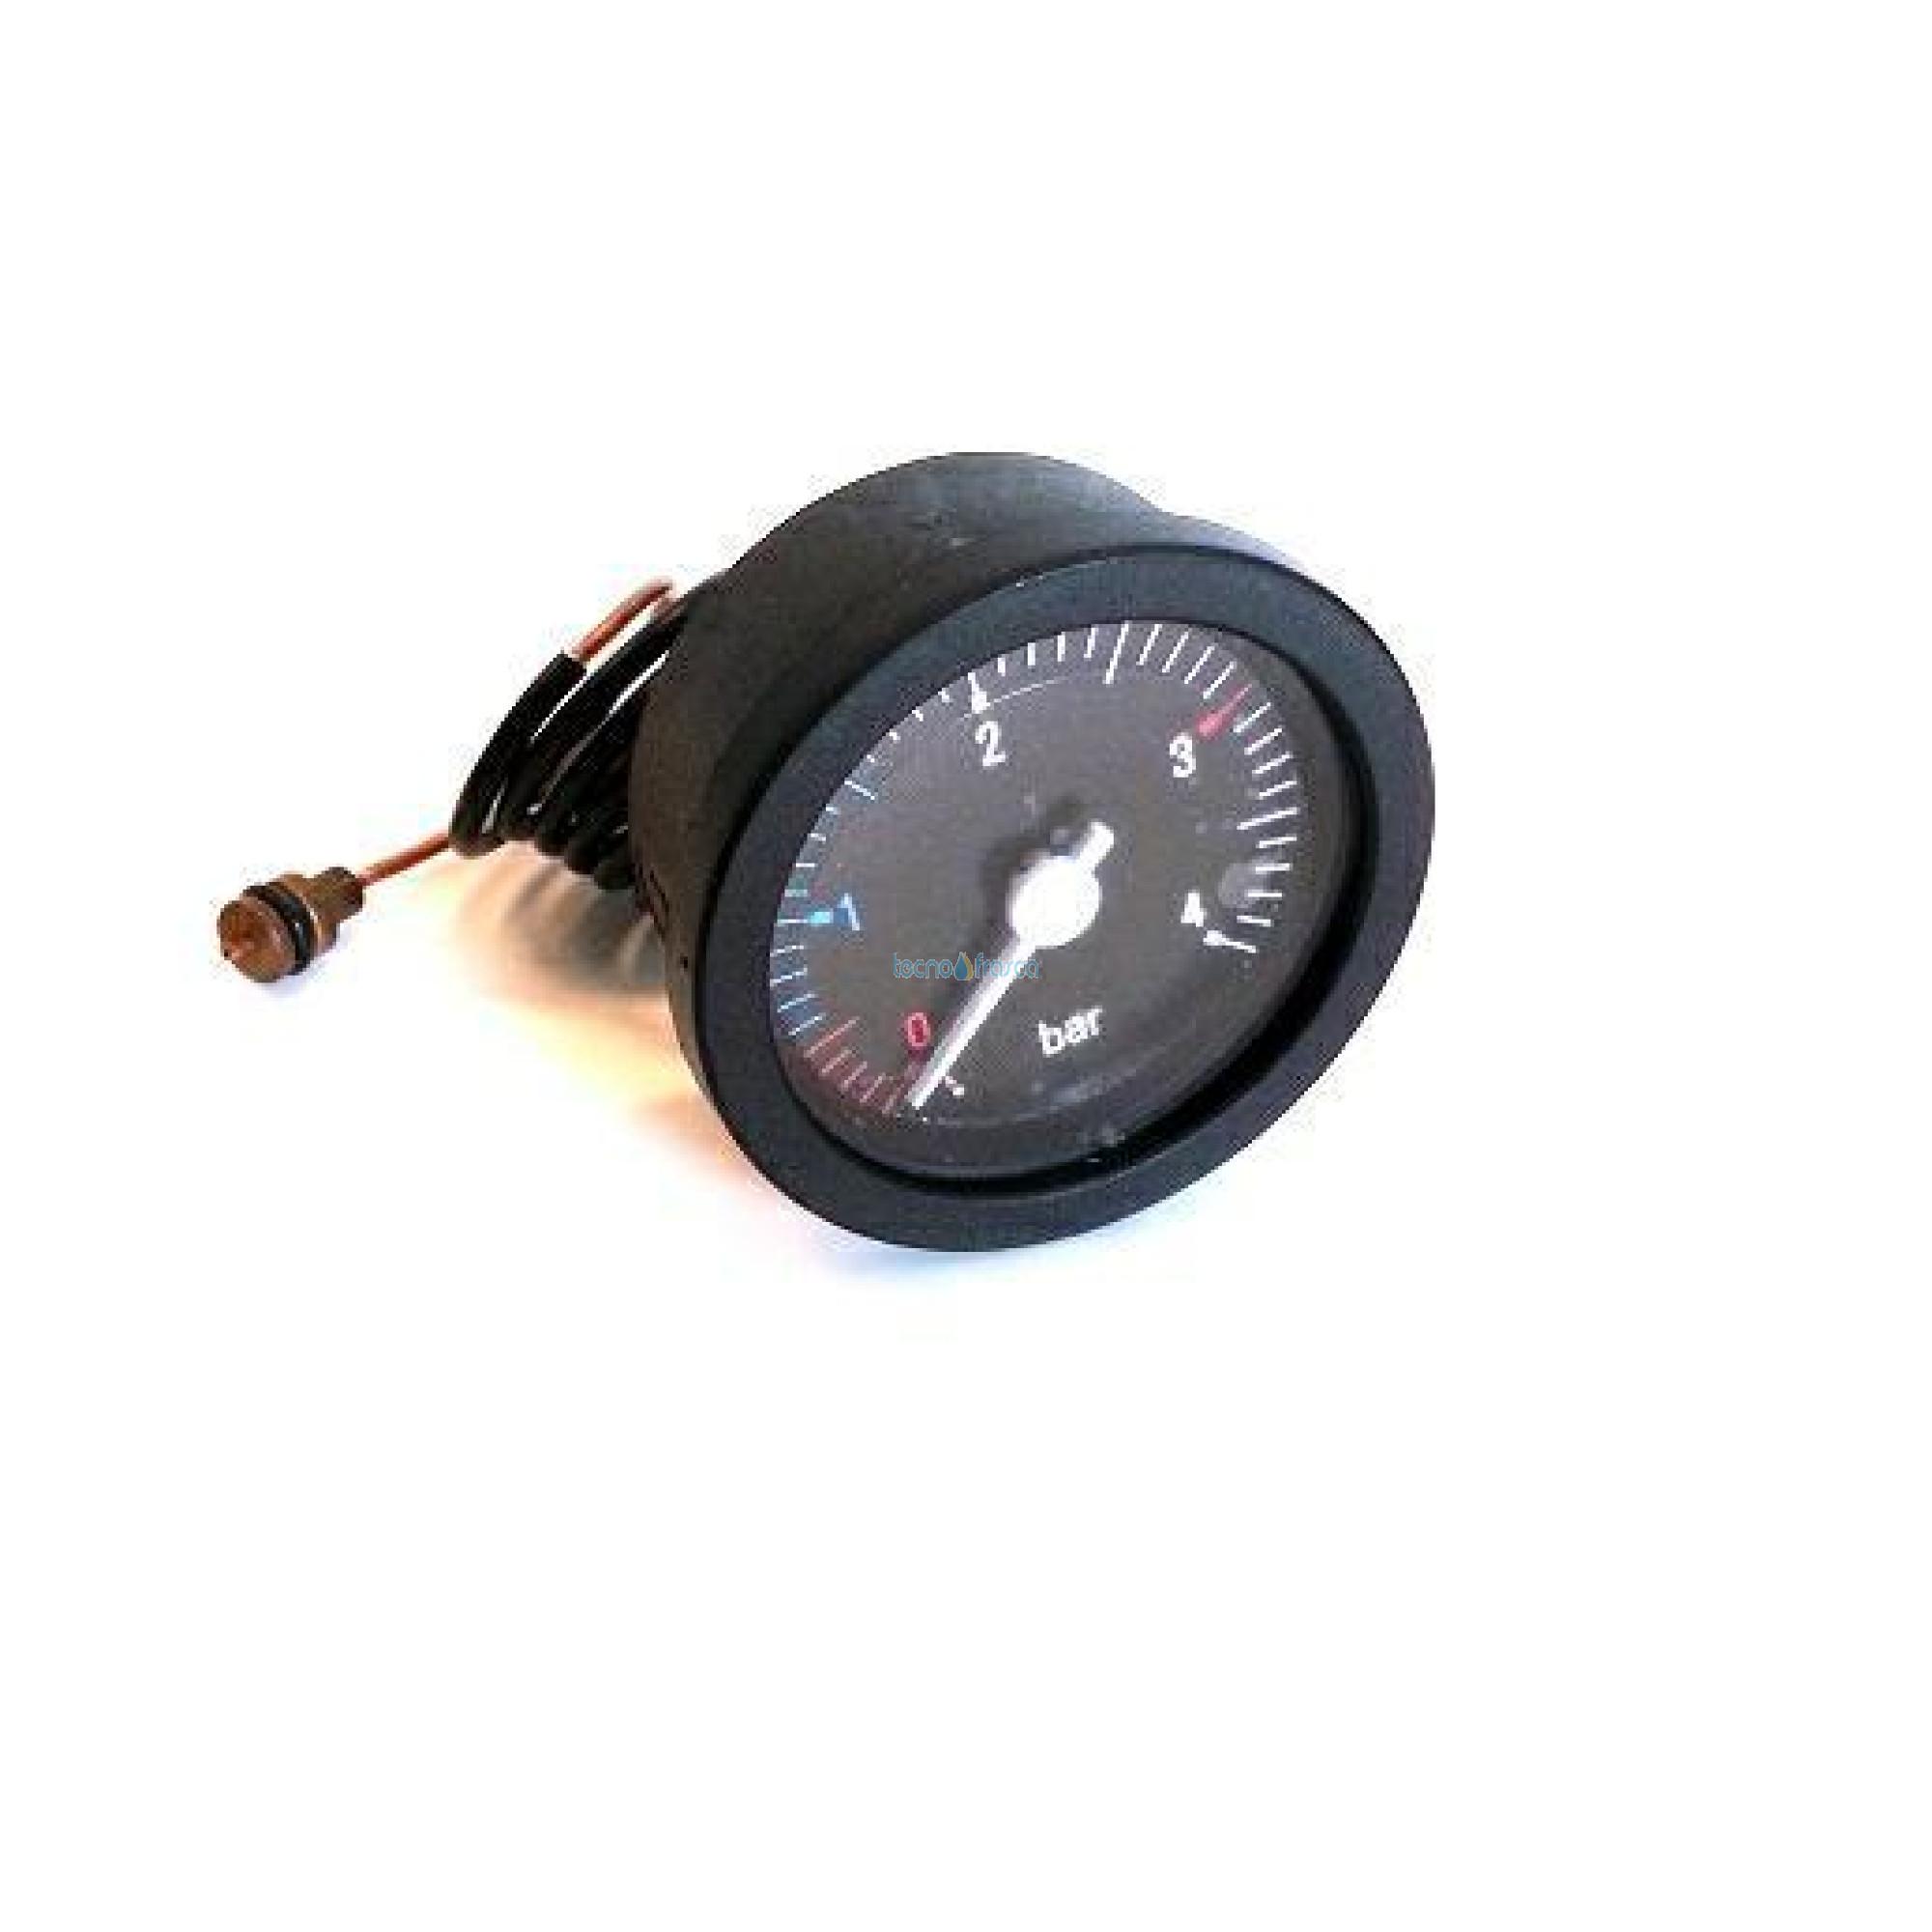 Beretta idrometro ad innesto rapido r7159